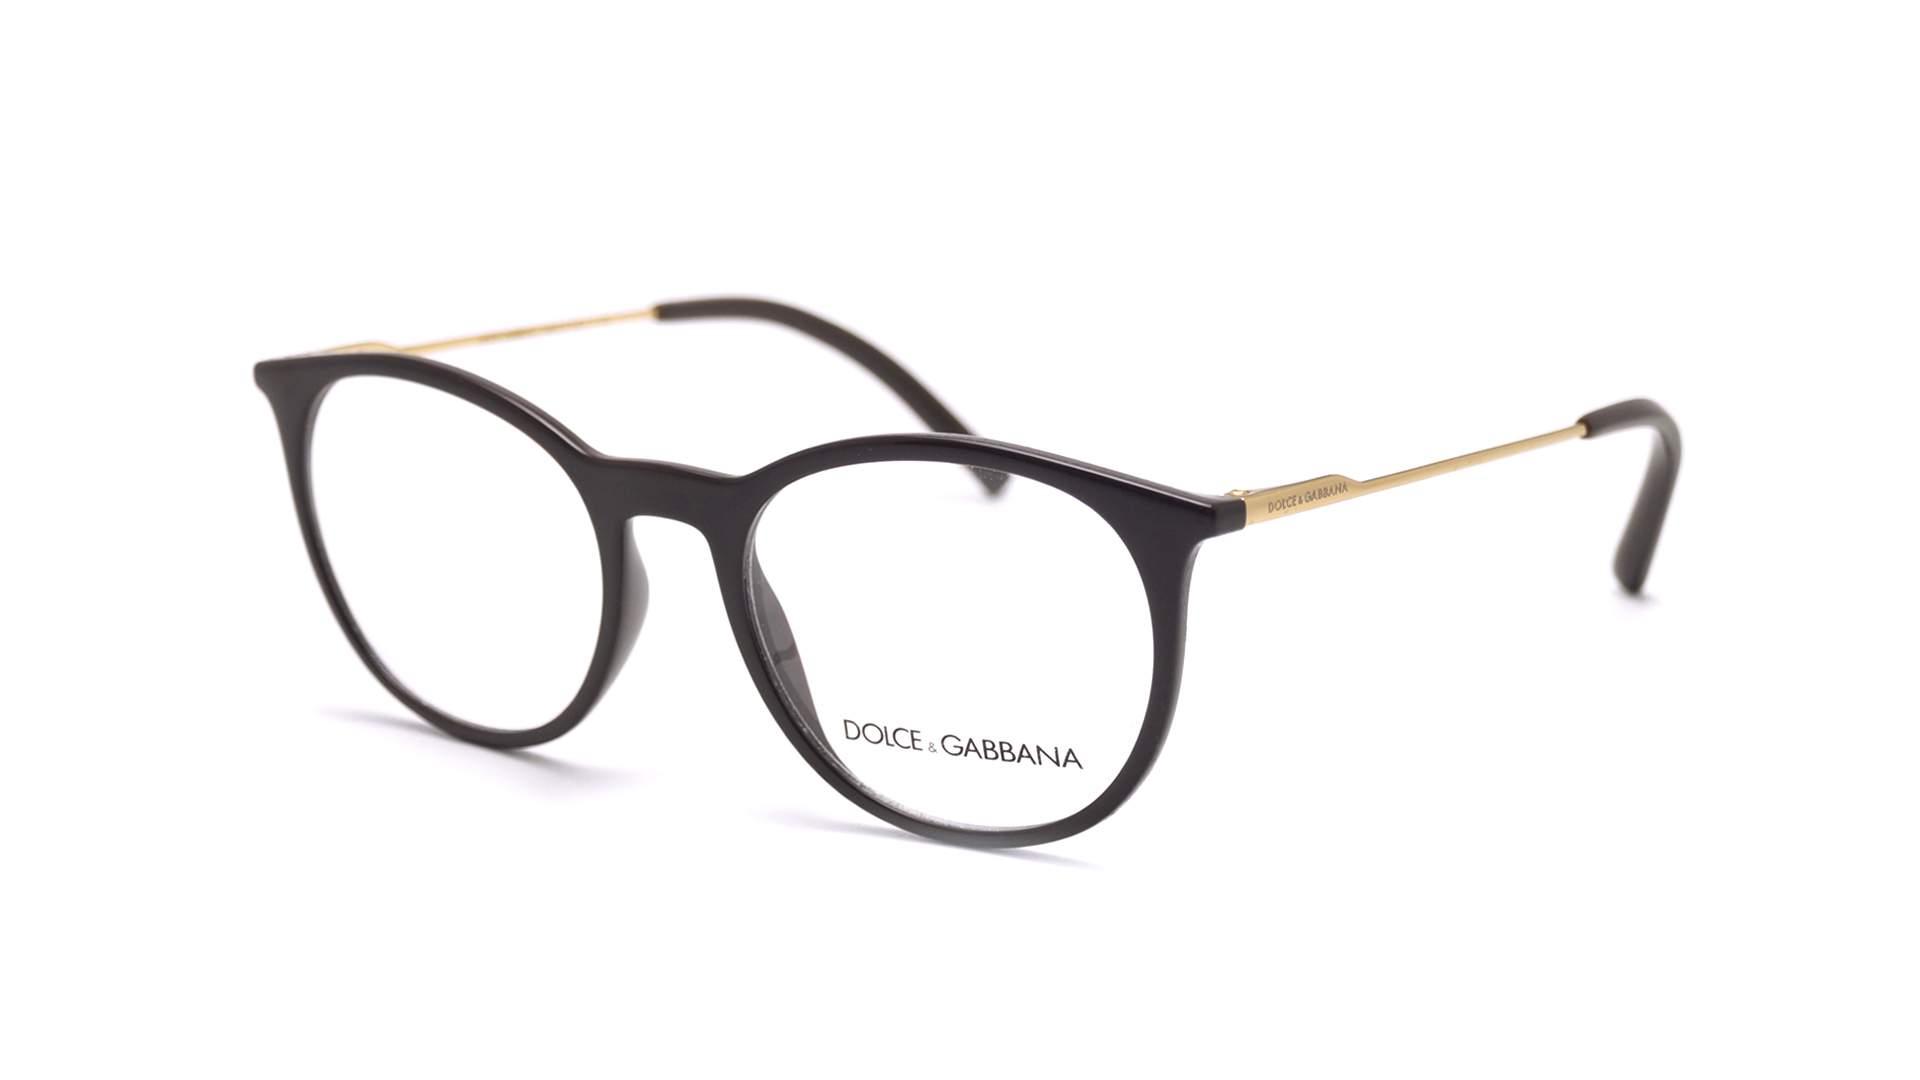 5efad8bb2060 Eyeglasses Dolce & Gabbana DG5031 3042 49-18 Brown Medium